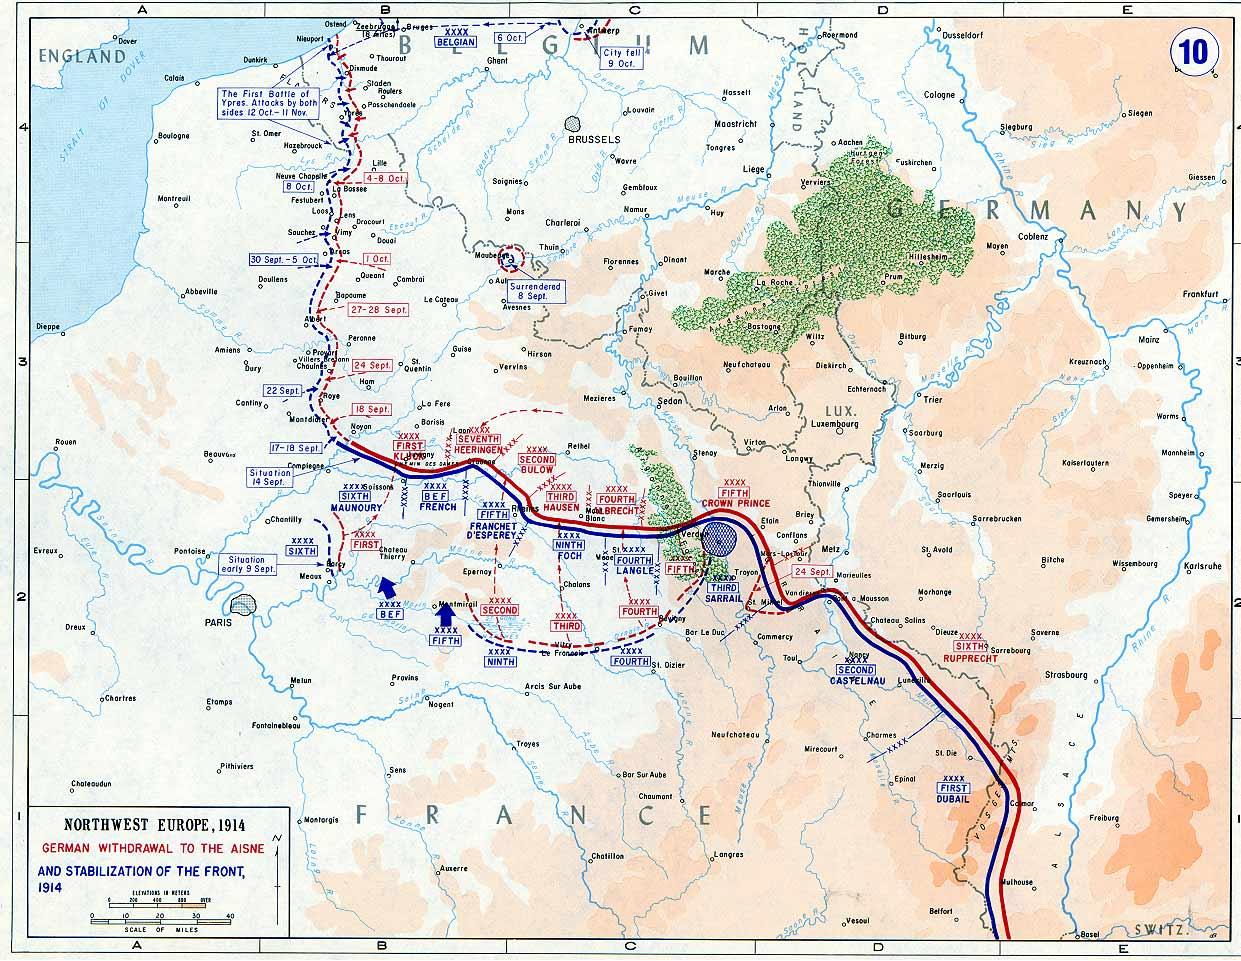 German retreat to the Aisne